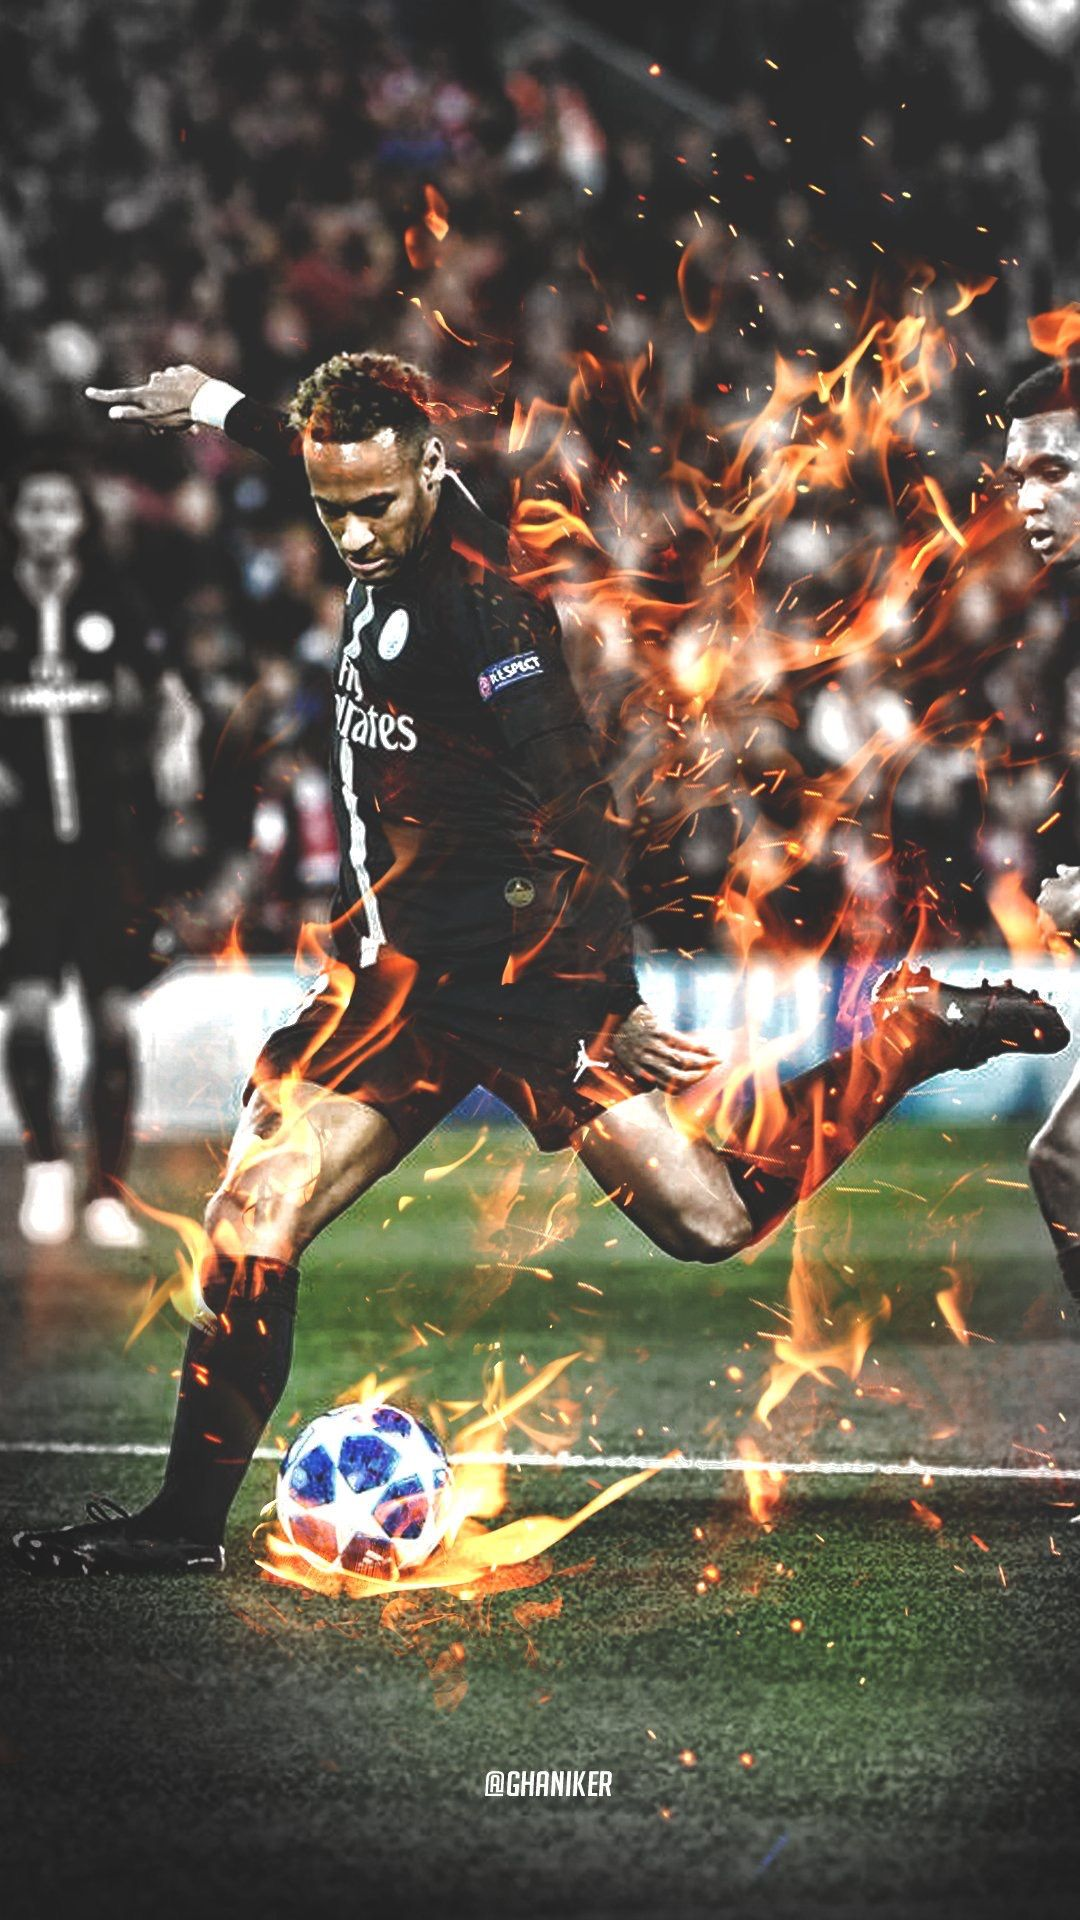 Pin by Sai Prem on Sports wallpapers Neymar jr, Neymar